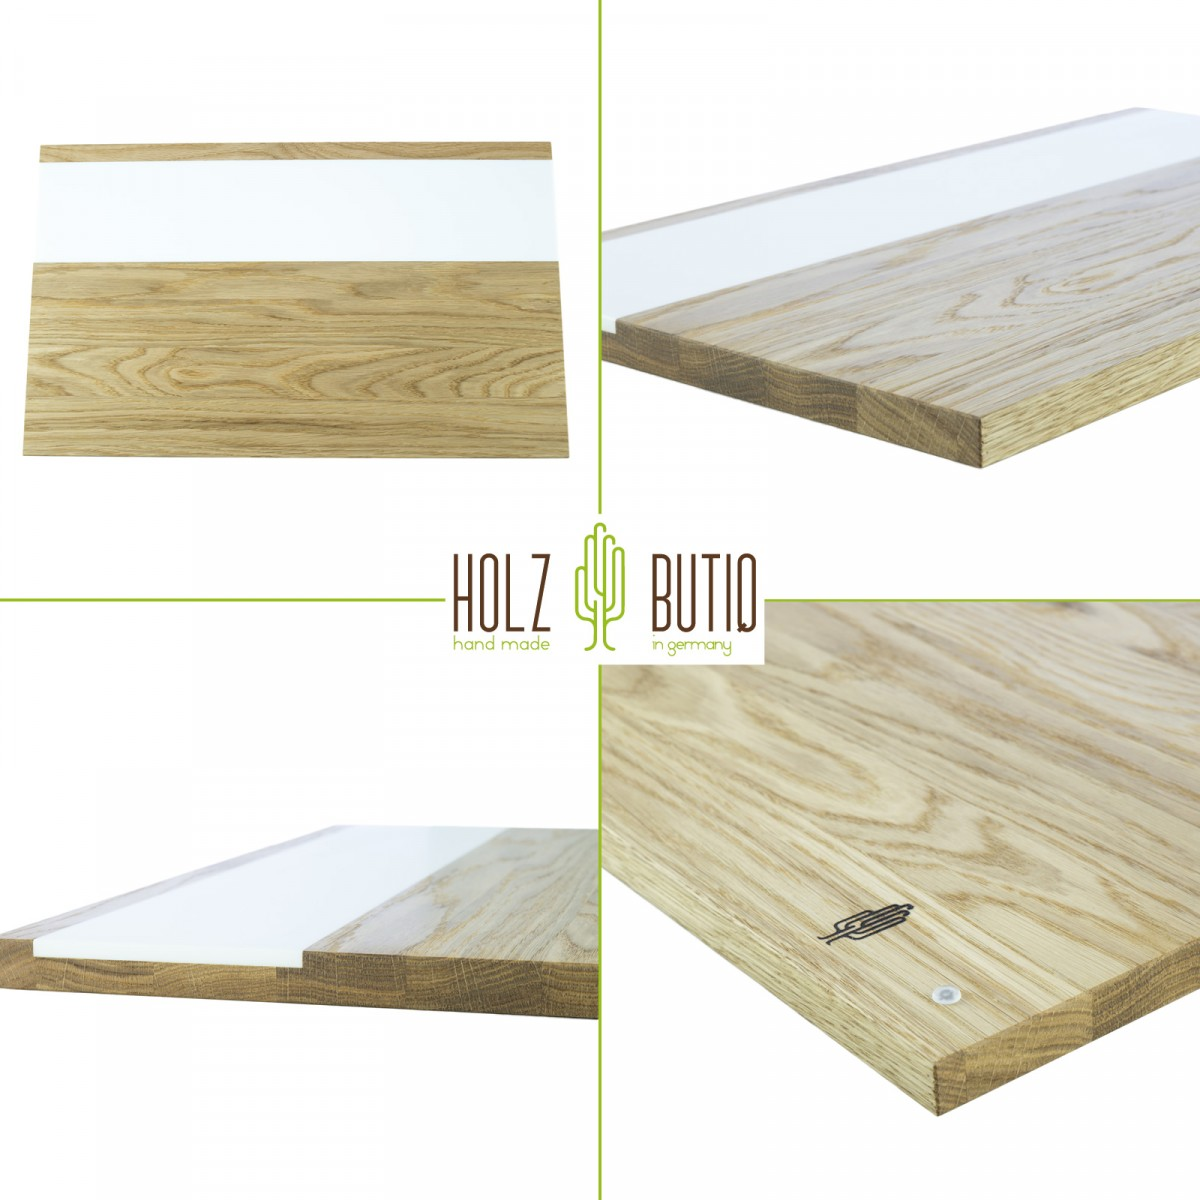 Servierbrett servir, Servierplatte aus Holz | Schneidebrett | Küchenbrett